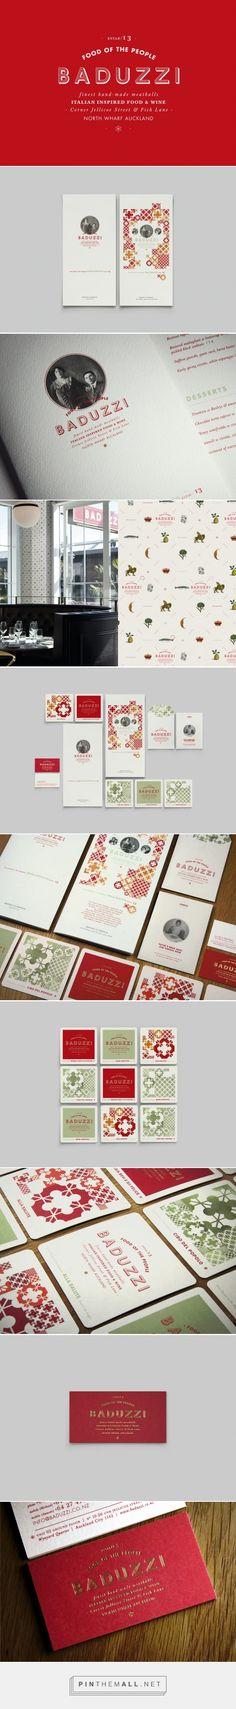 Best Awards - One Design. / Baduzzi - created via http://pinthemall.net